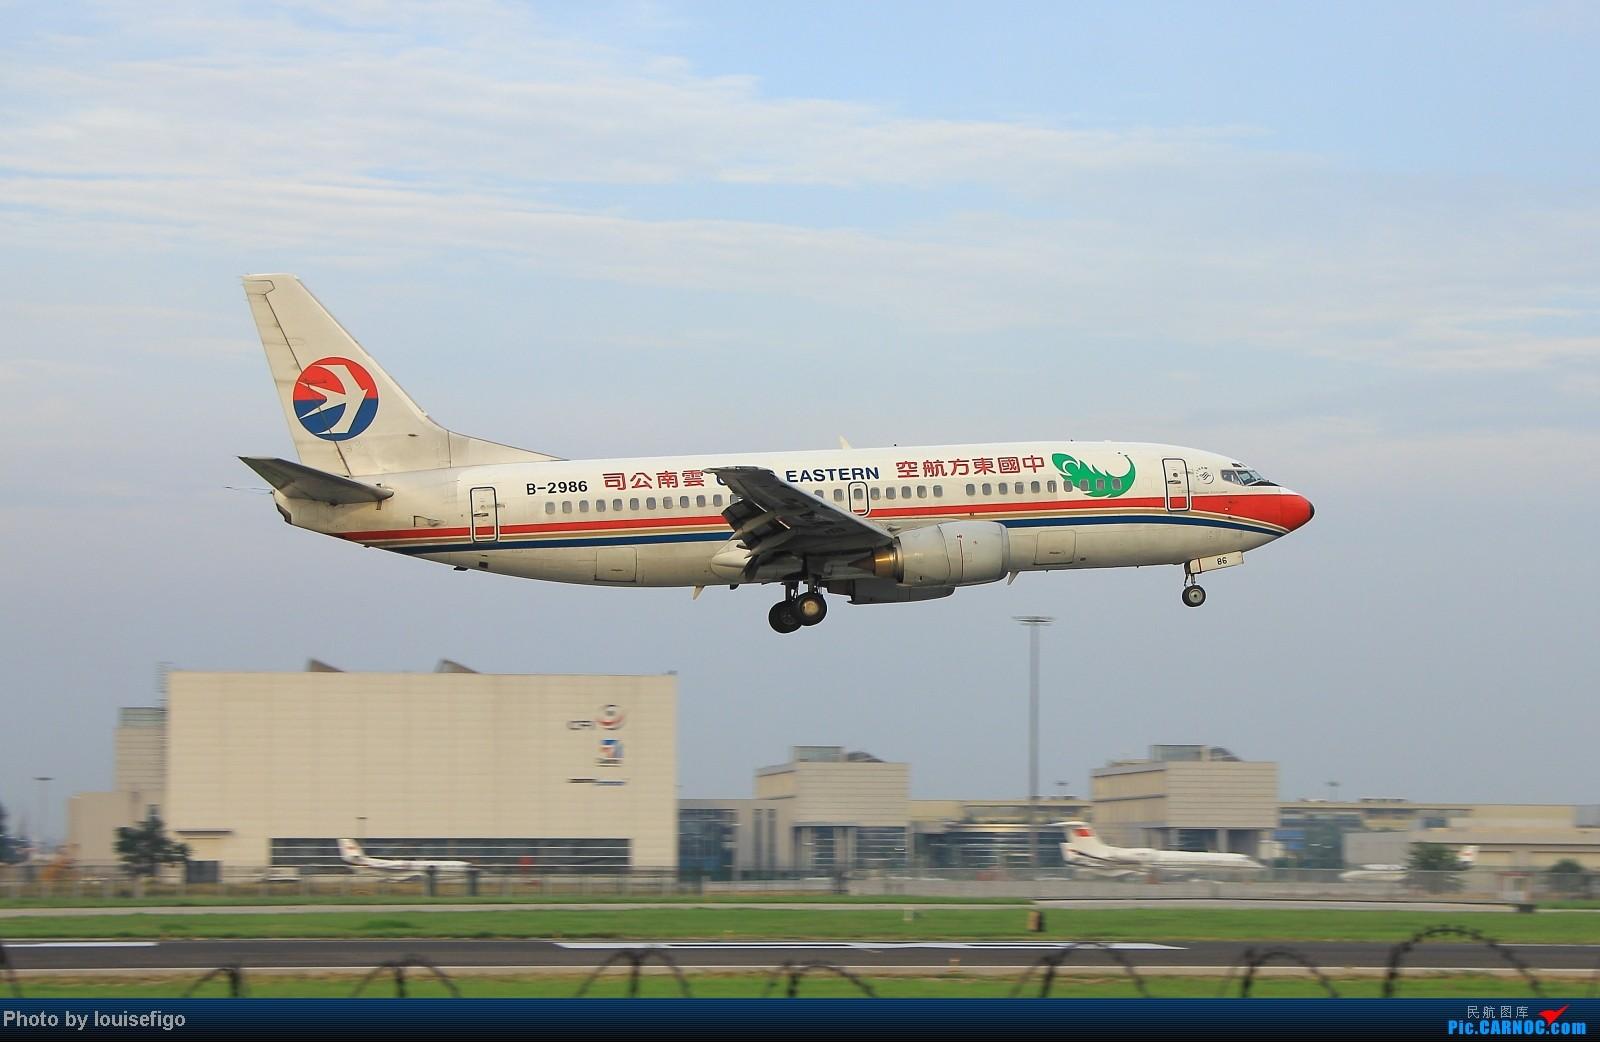 Re:[原创]闲来无事天气闷,发点冷饭自娱乐!!!PEK西跑的降落杂图~发到哪儿是哪儿啊!随心情! BOEING 737-300 B-2986 北京首都国际机场